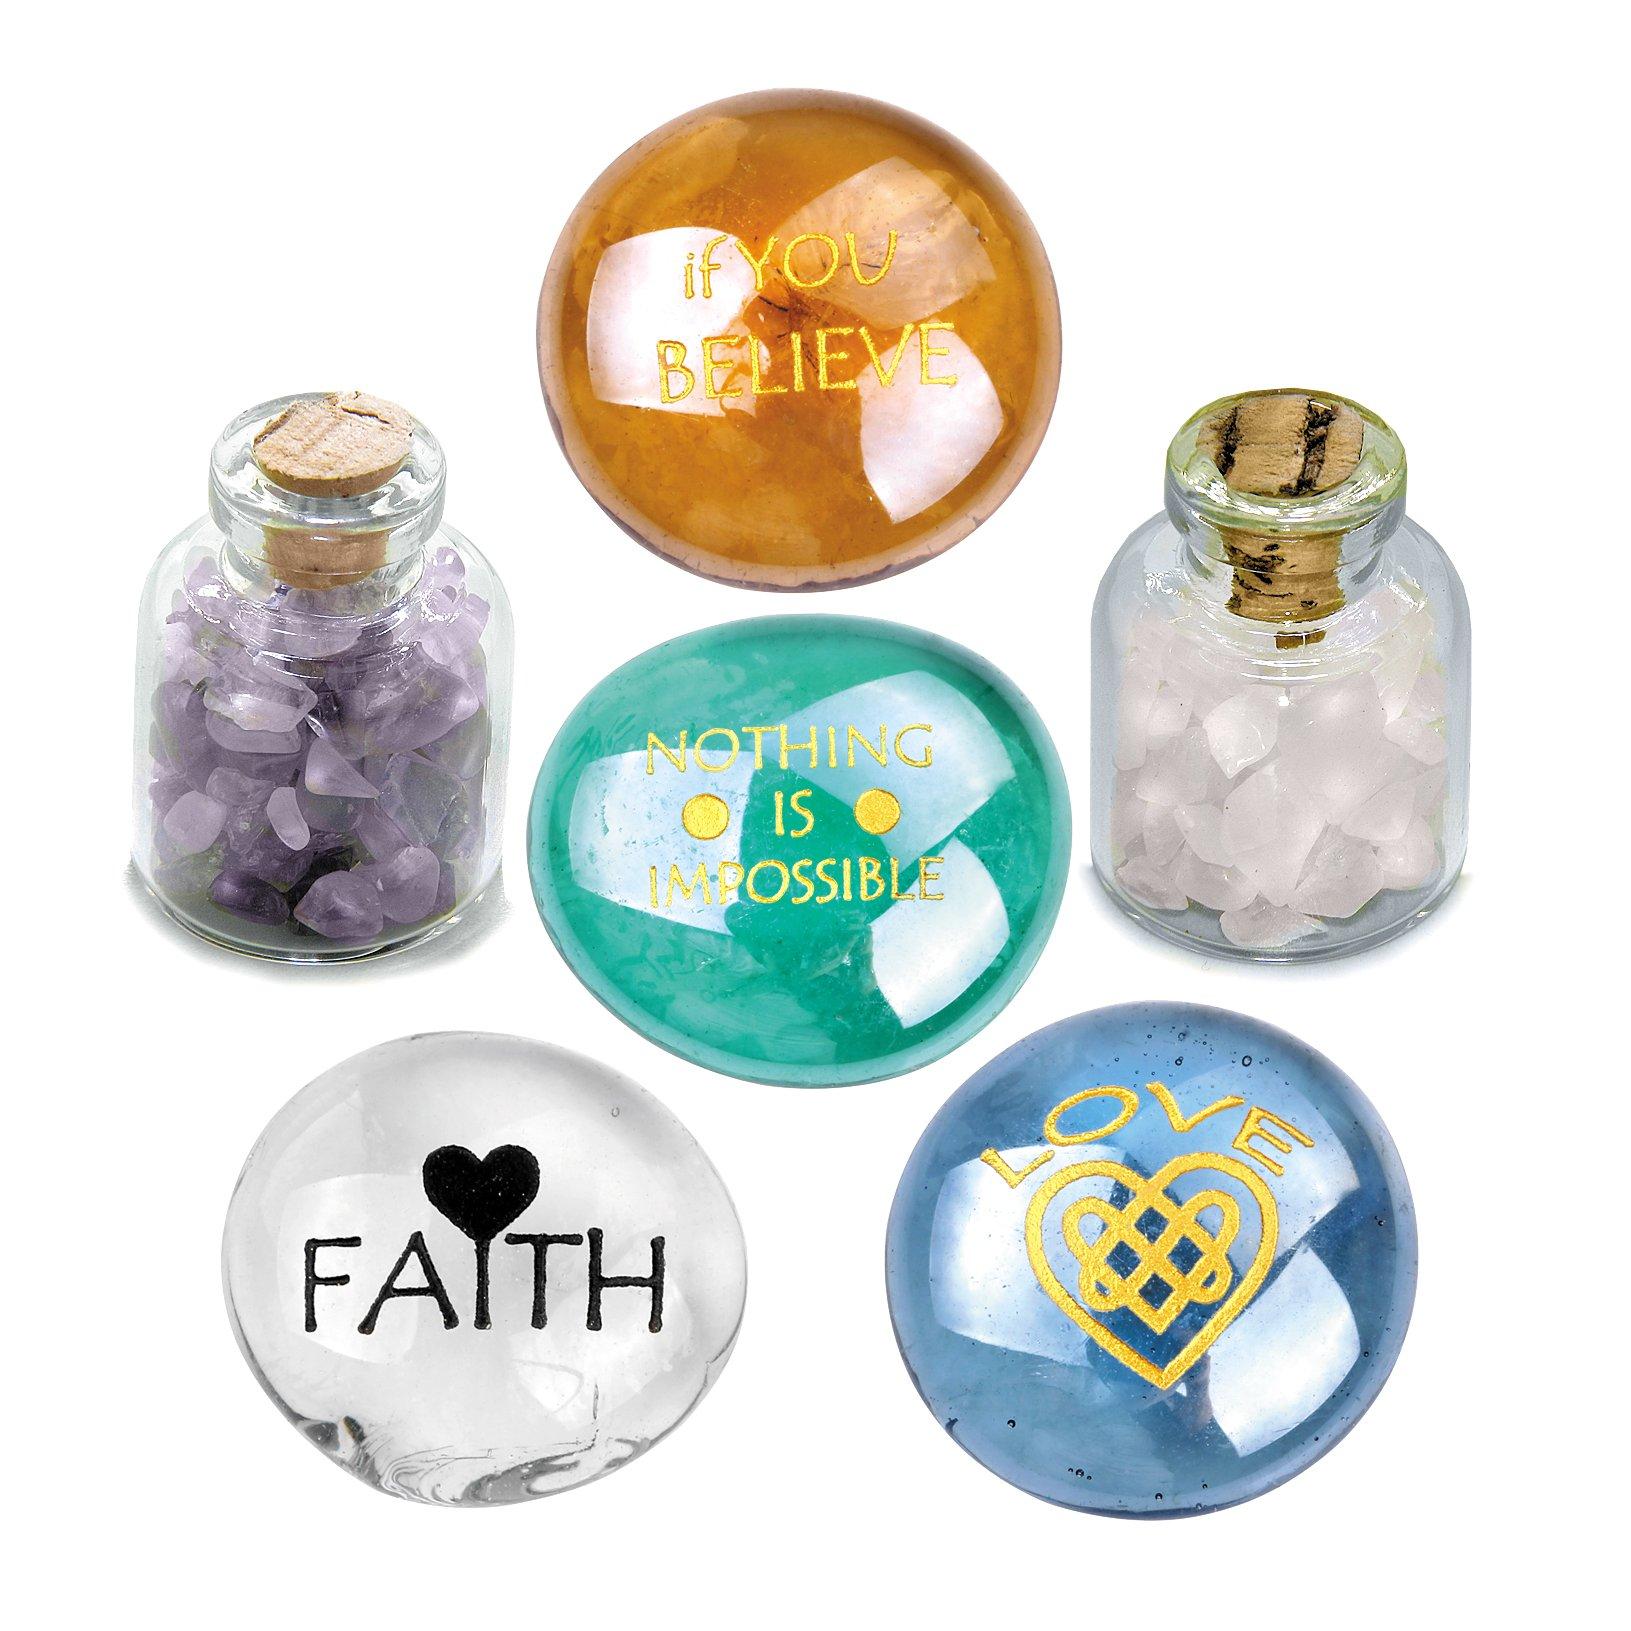 Believe Love and Faith Motivation Inspirational Amulets Glass Stones Amethyst Rose Quartz Bottles Set